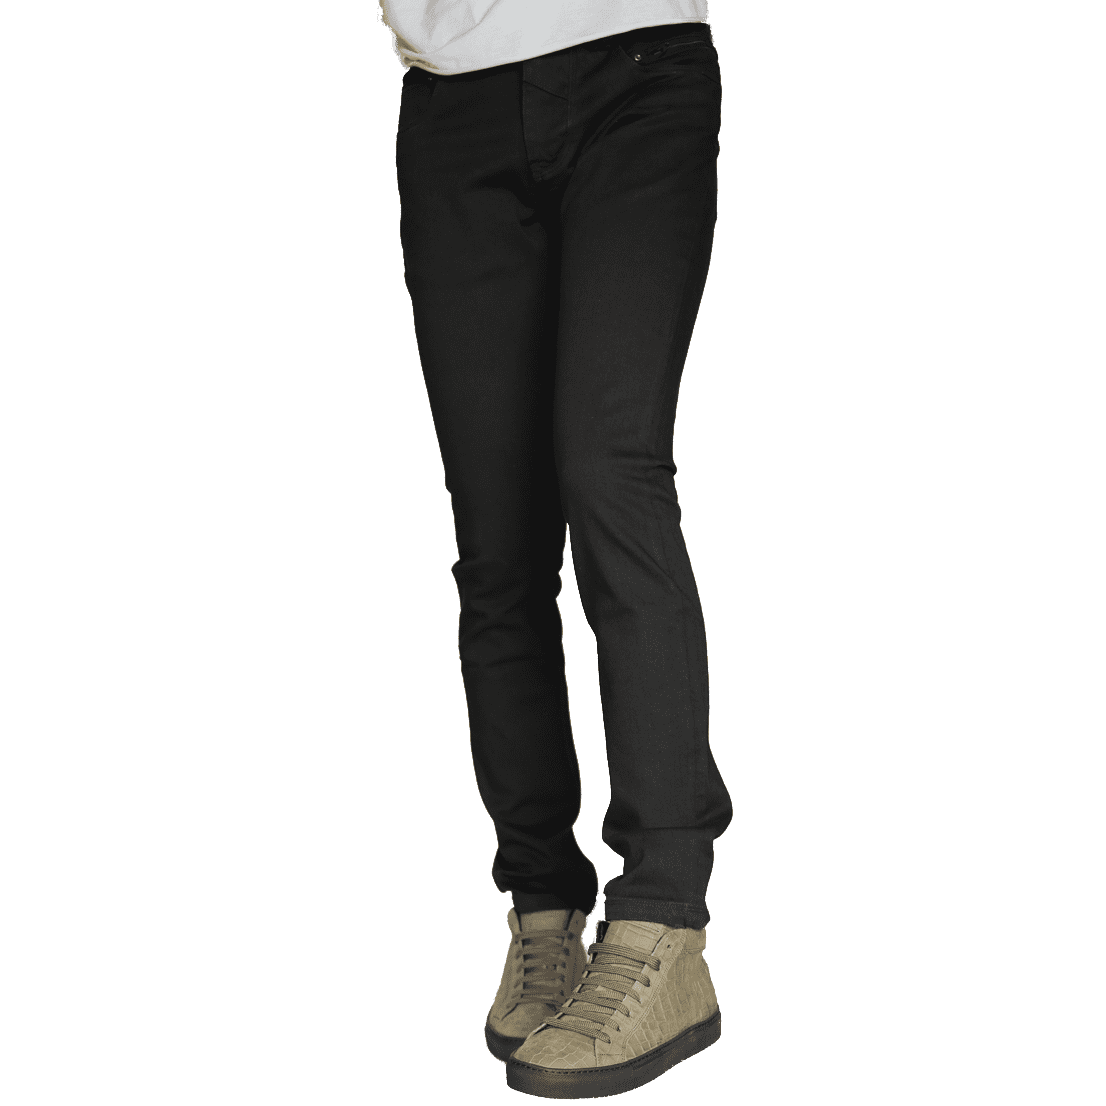 Cabinero Stiles Berlin Jeans Johnny Love, schwarz Herrenhosen 2017 4